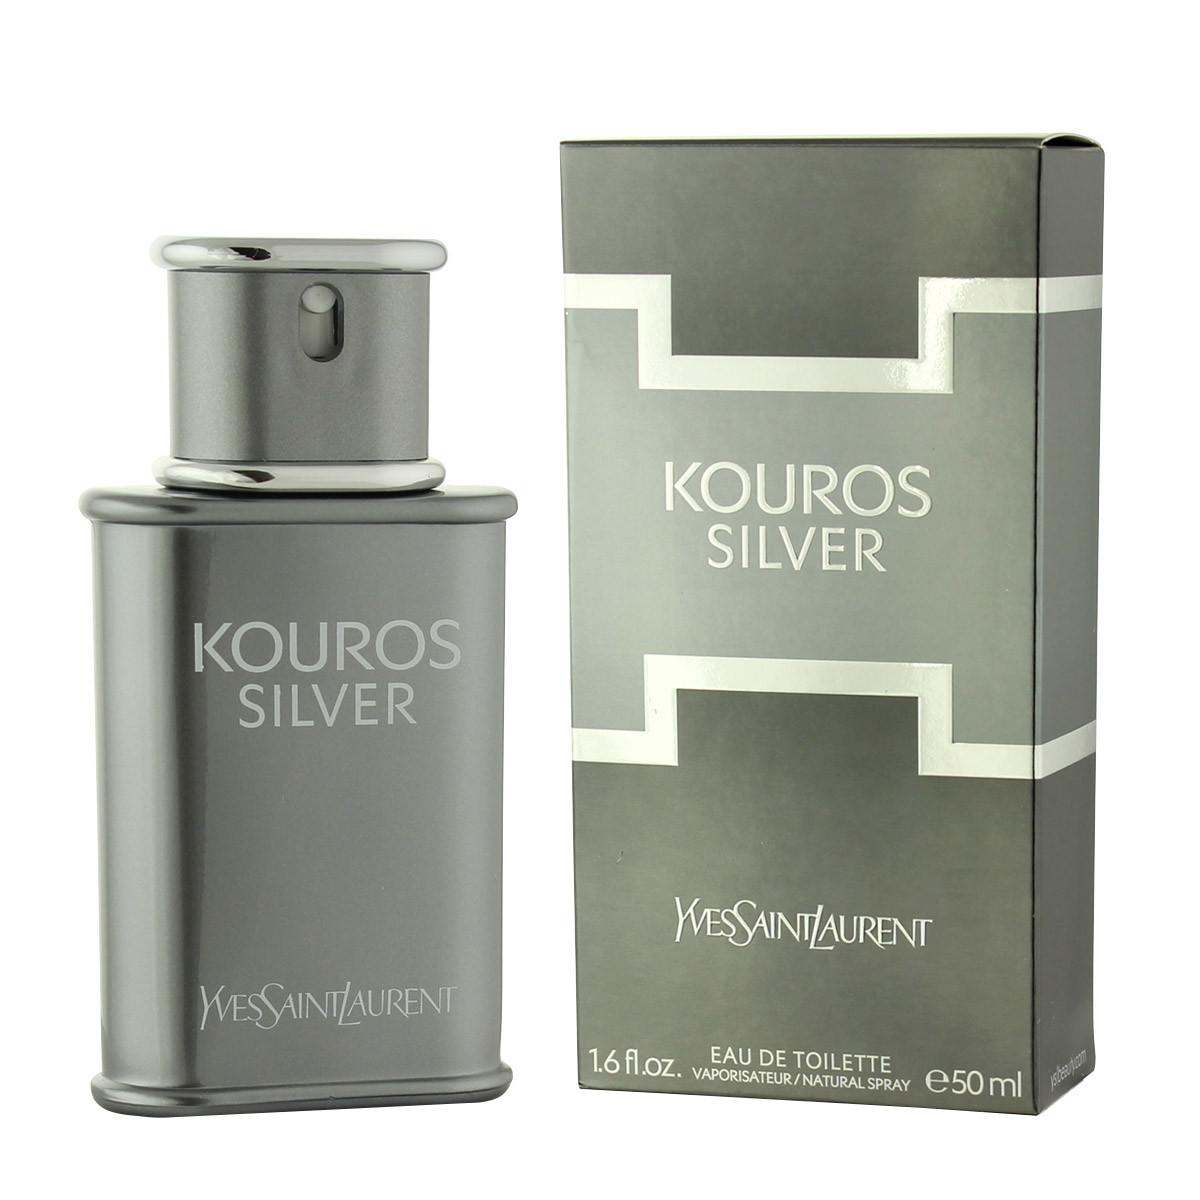 76a9aed396 Yves Saint Laurent Kouros Silver EDT 50 ml M - Kouros Silver - Yves ...